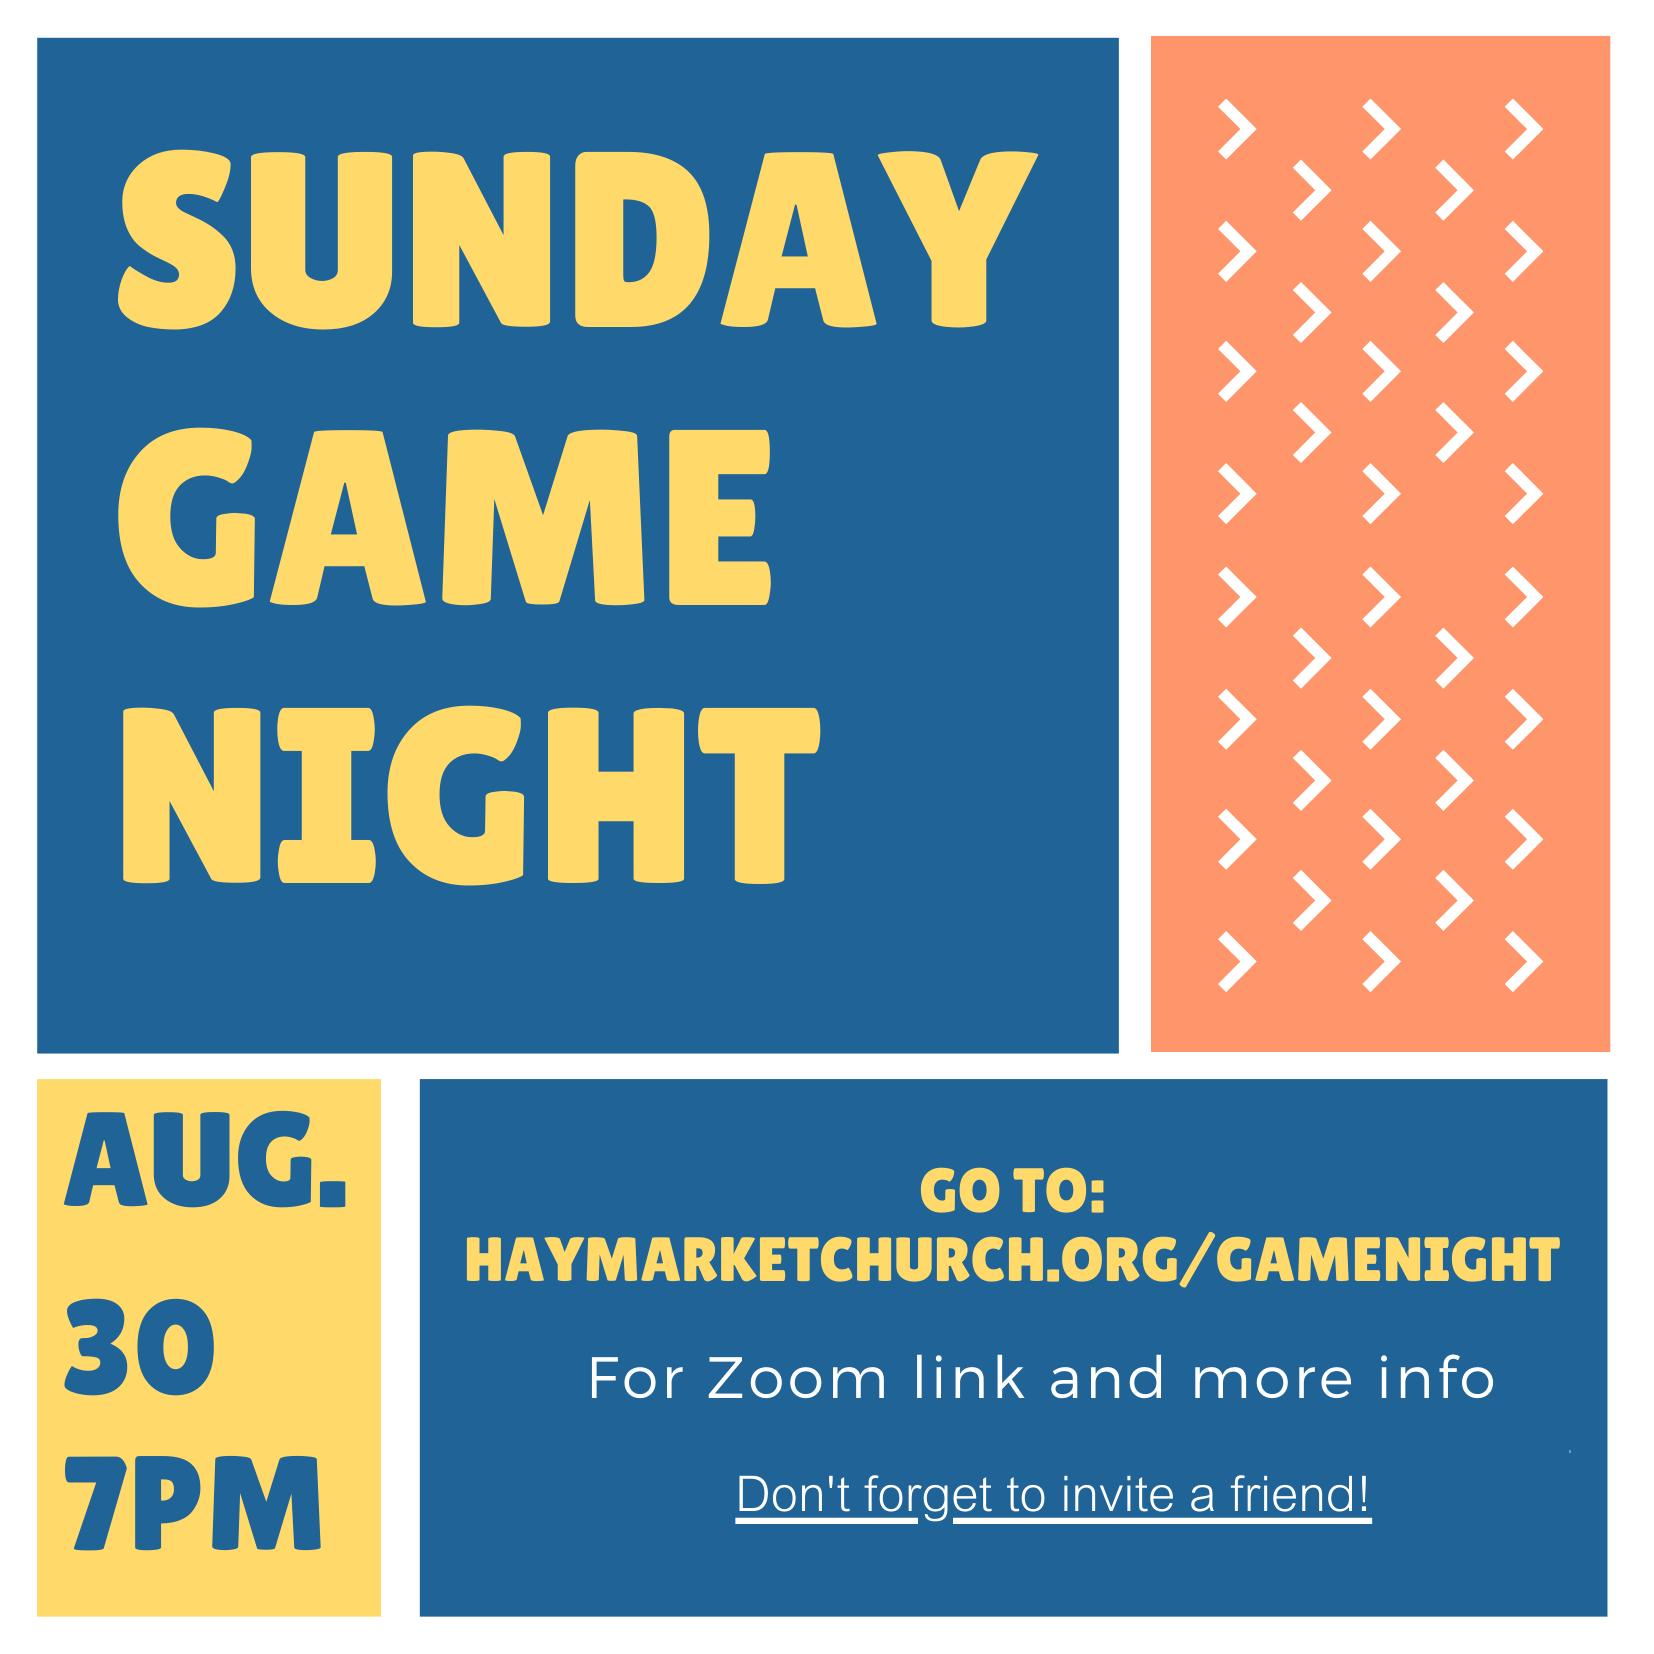 Sunday Game Night August 30